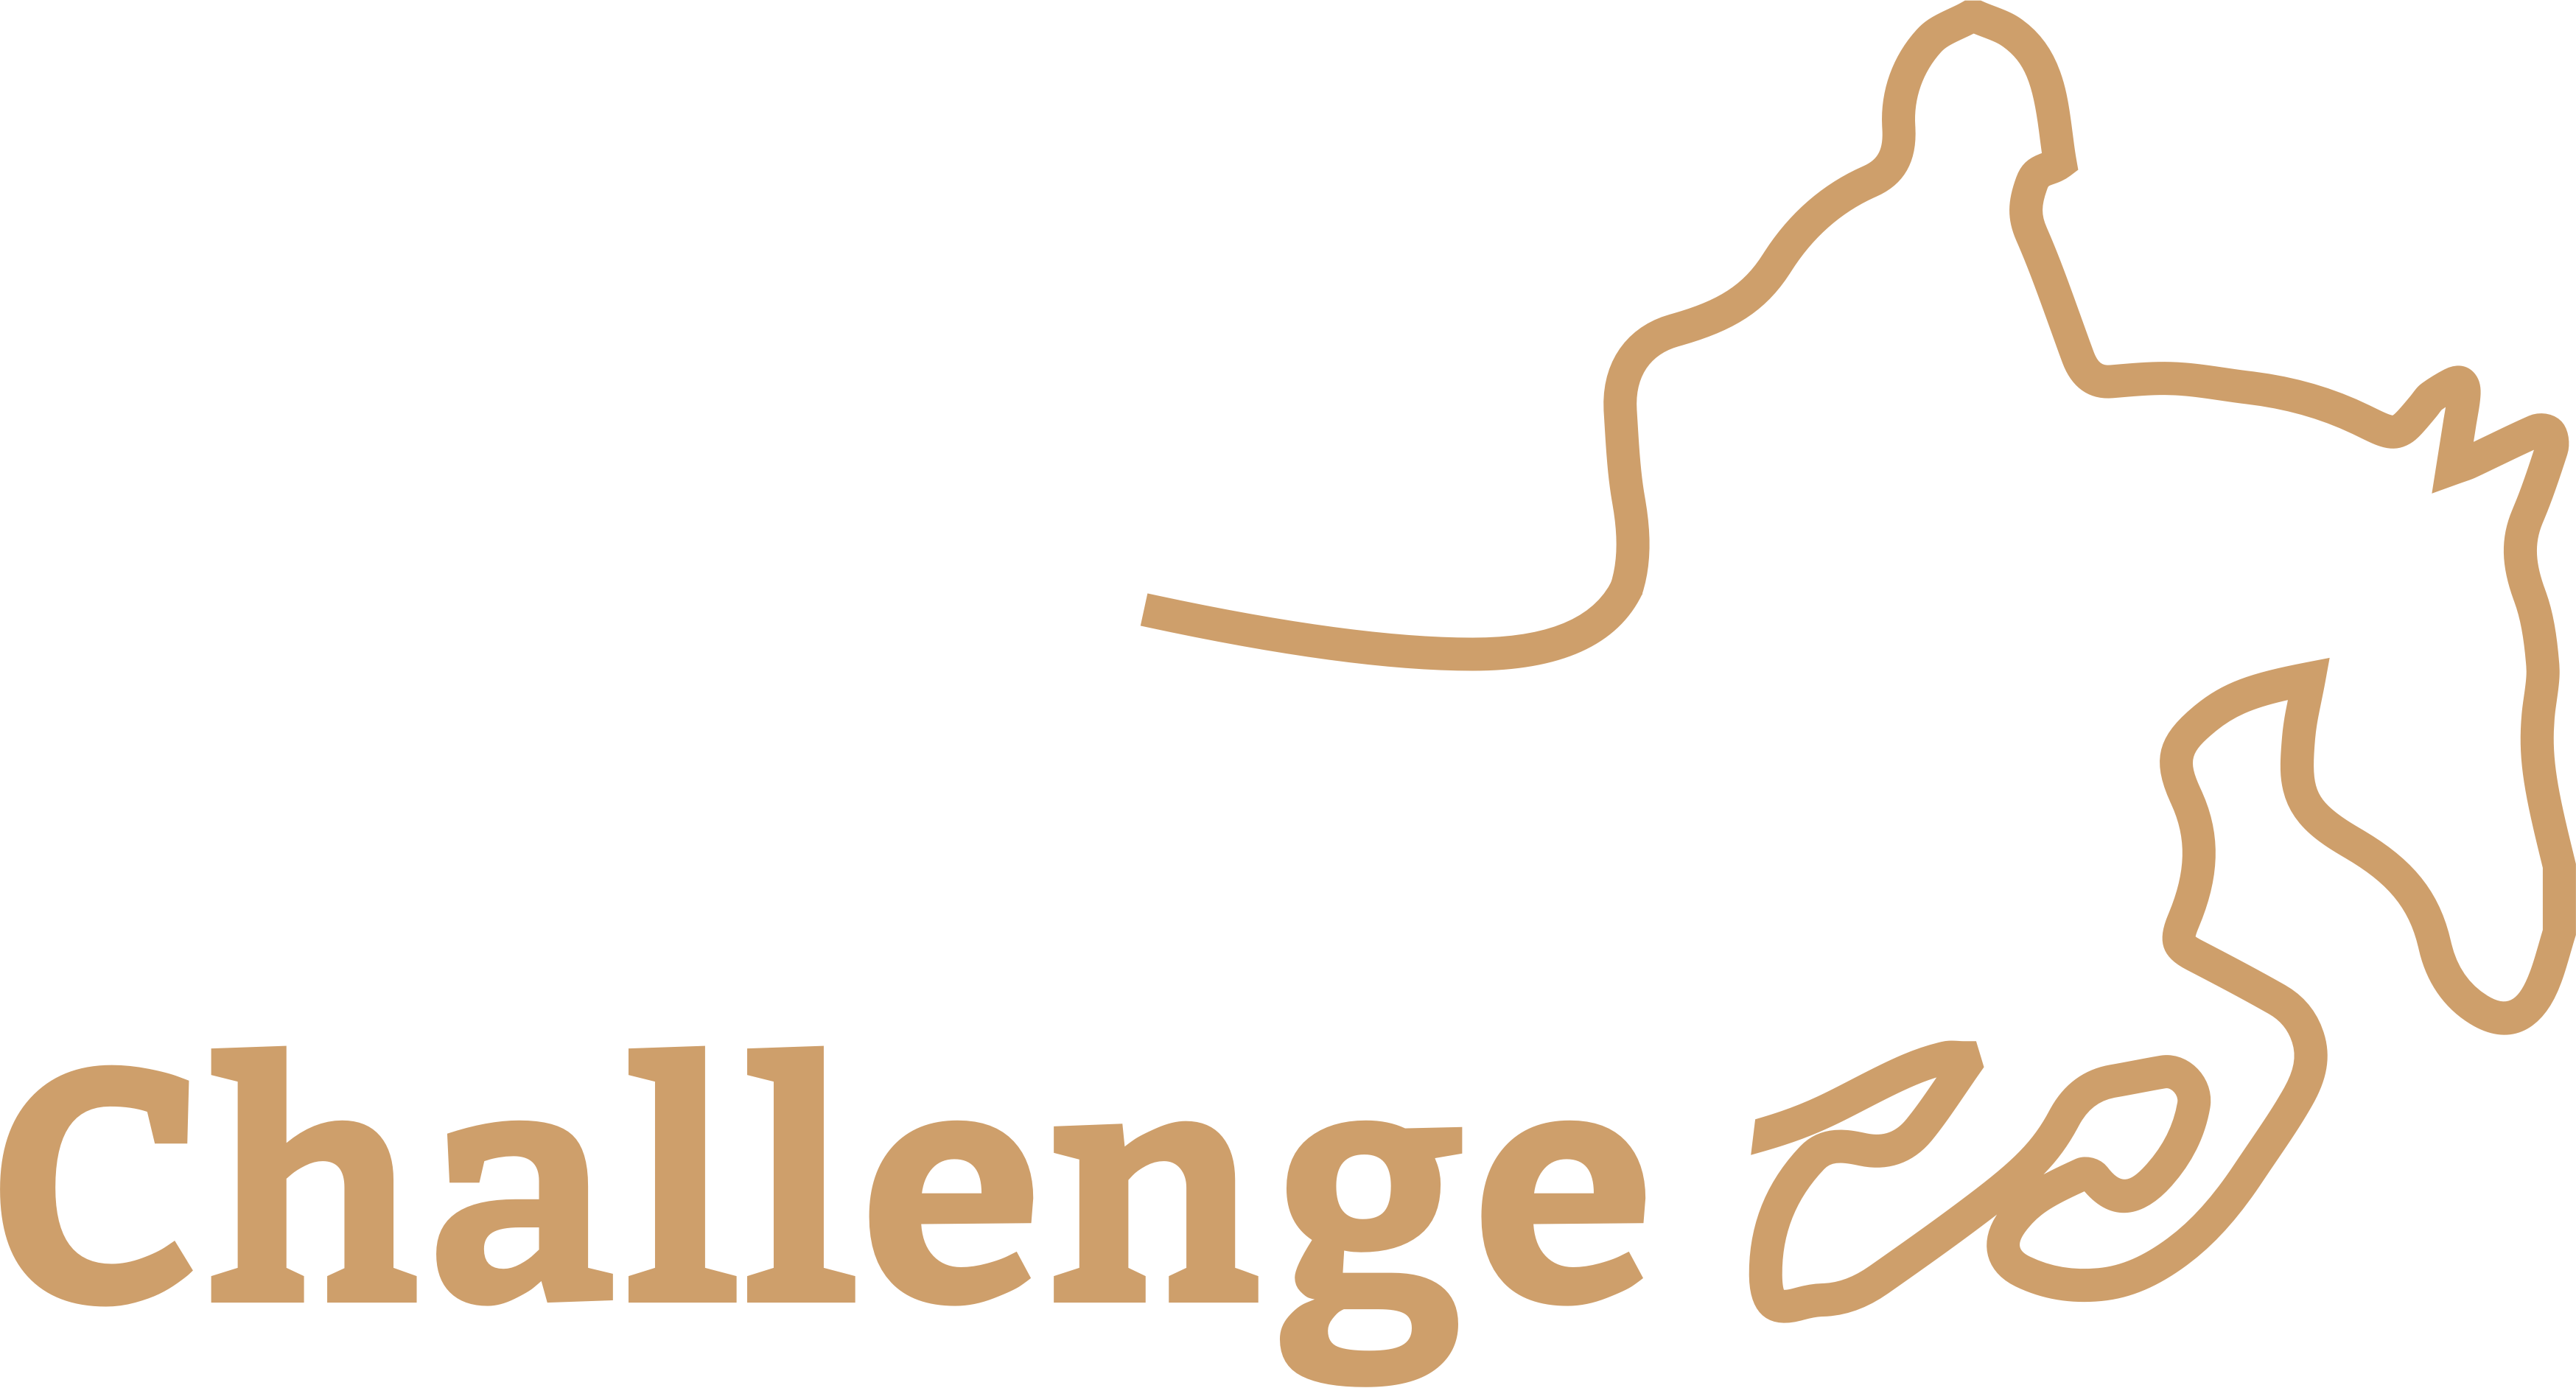 Riders Challenge